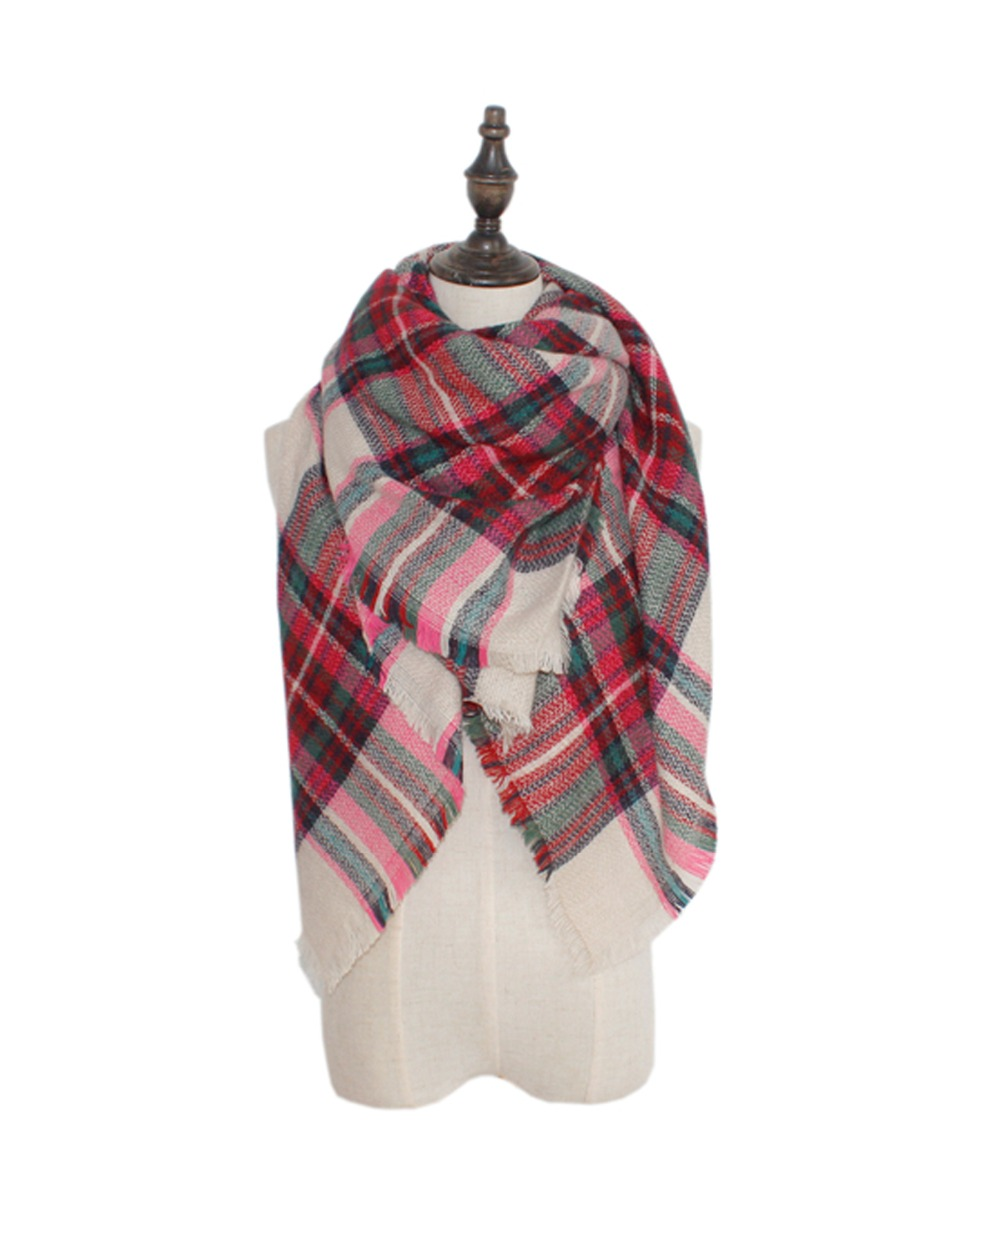 Woman Warm Mint Knit Snug font b Tartan b font Fringe Blanket Scarf American Style MutifuNctional